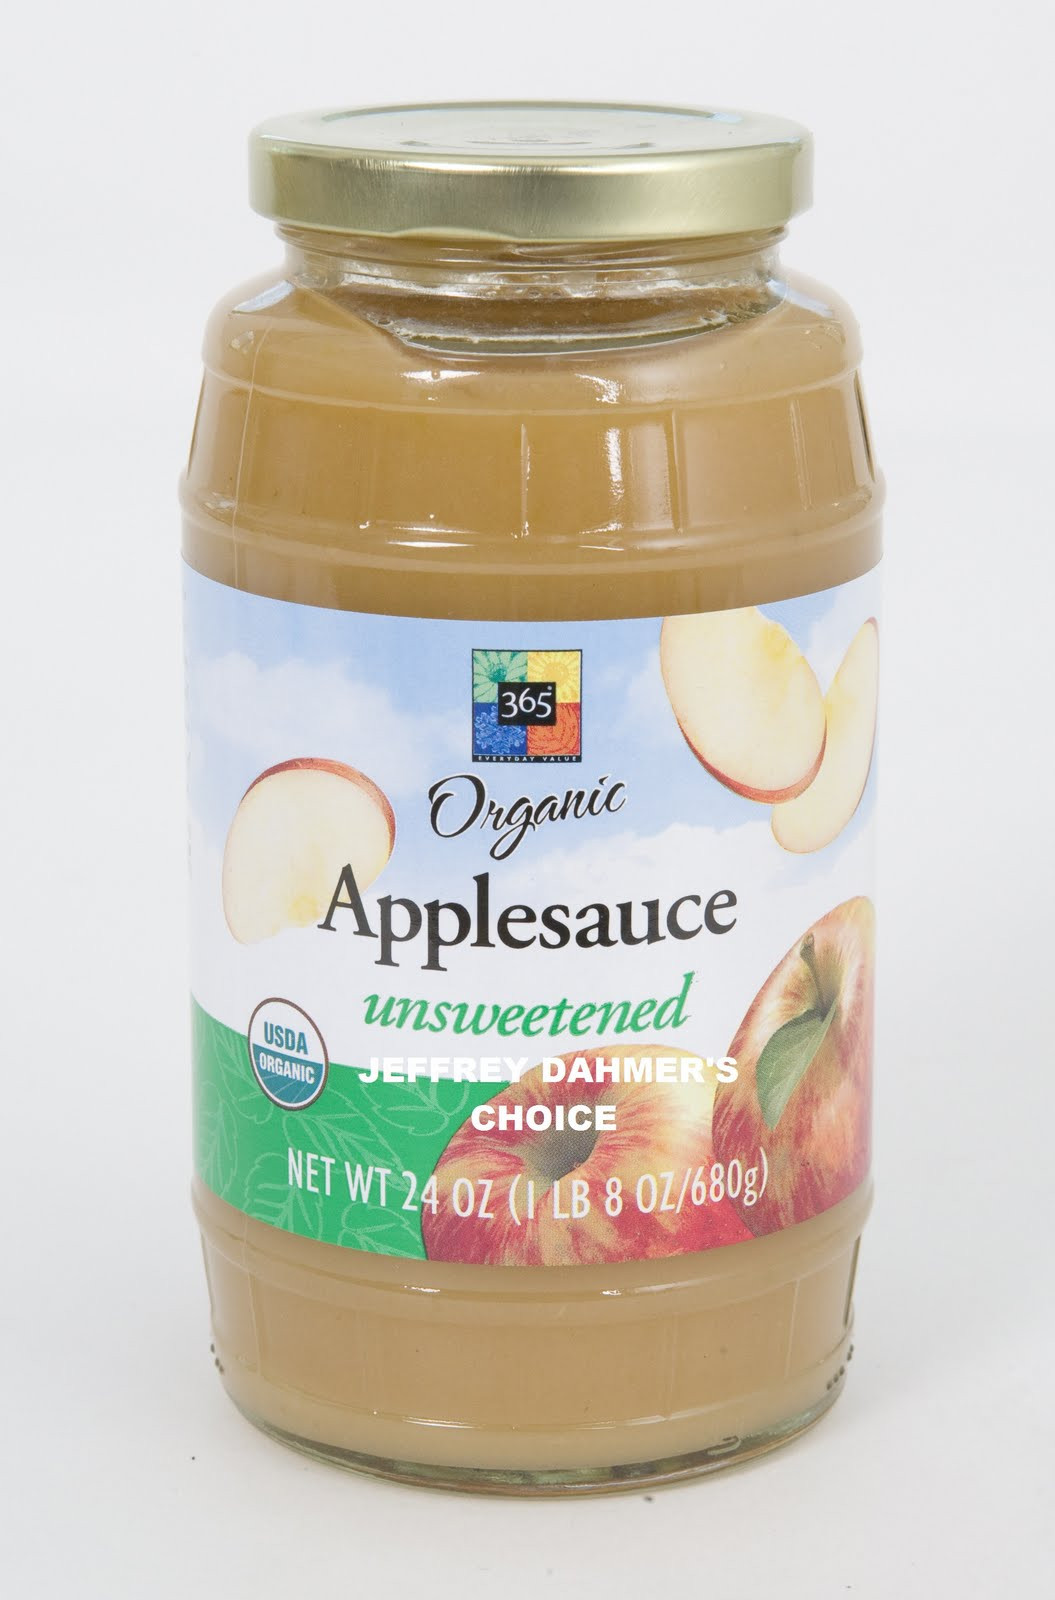 Organic Unsweetened Applesauce  Raising Giants August 2011